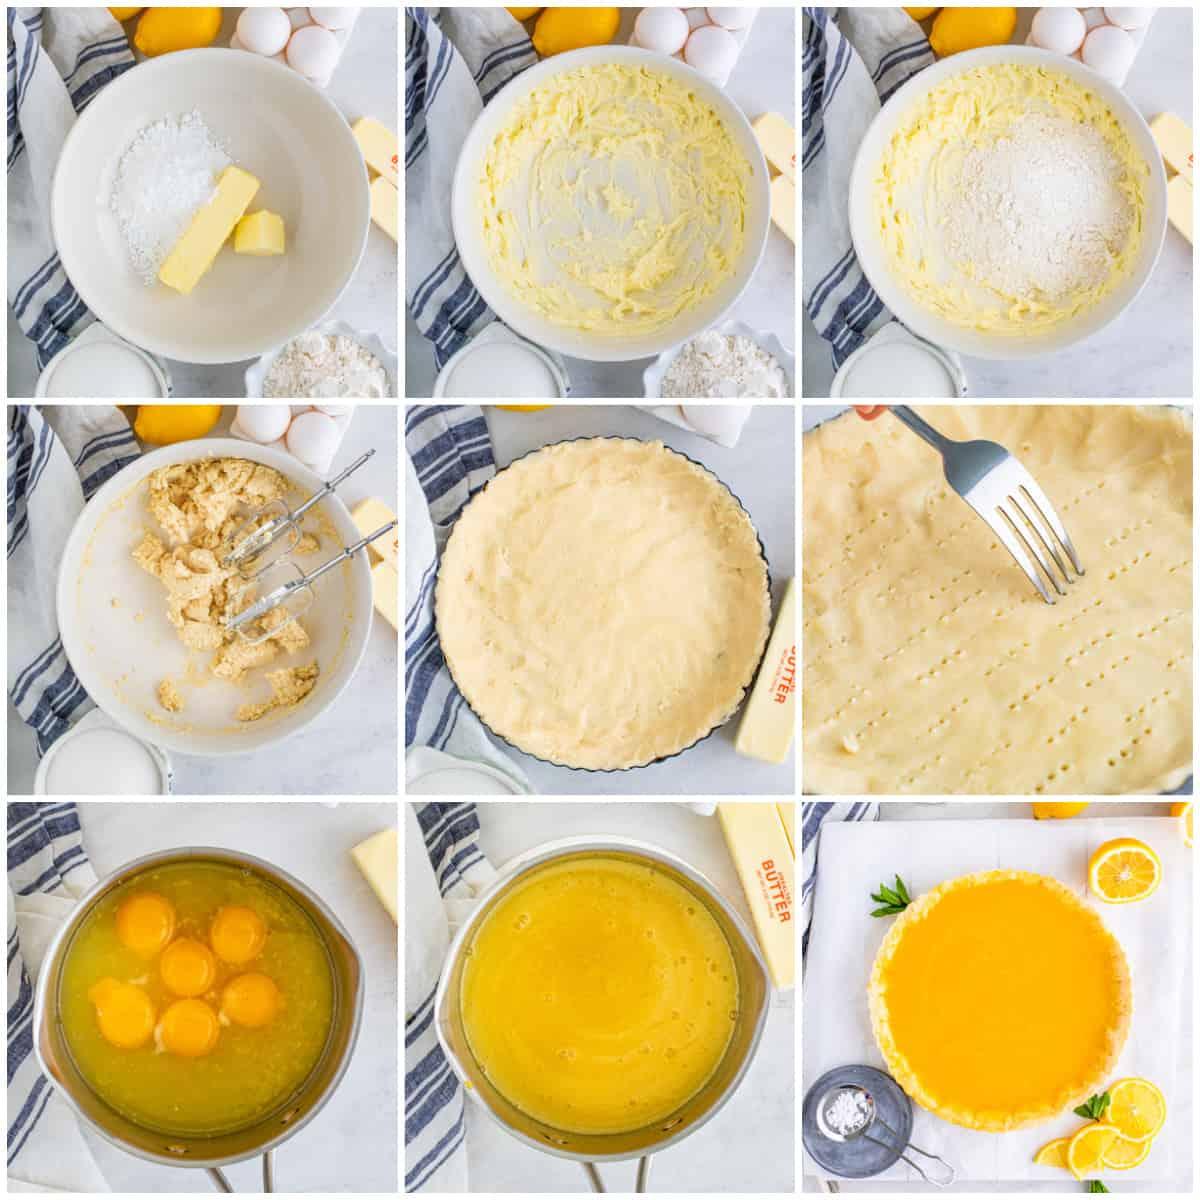 Step by step photos on how to make a Lemon Tart